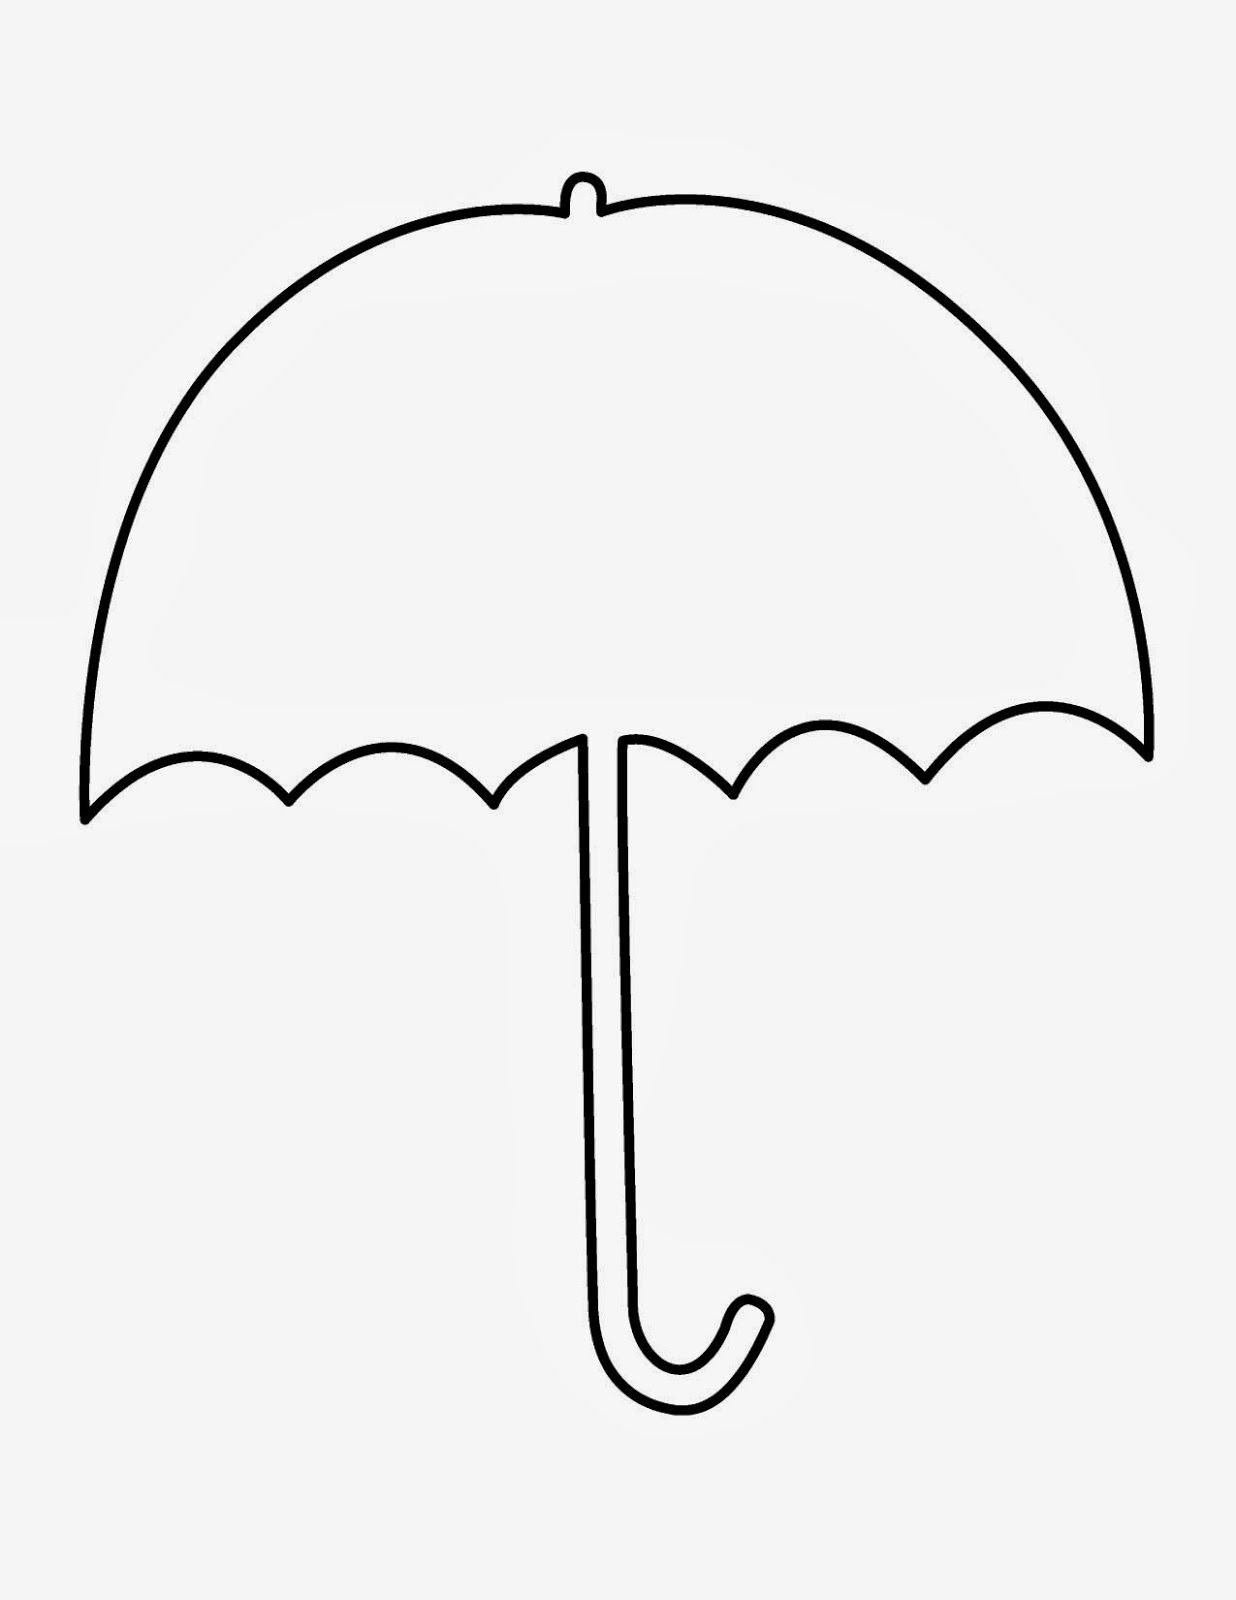 Spring Book 2 Yellow Umbrella Umbrella Template Umbrella